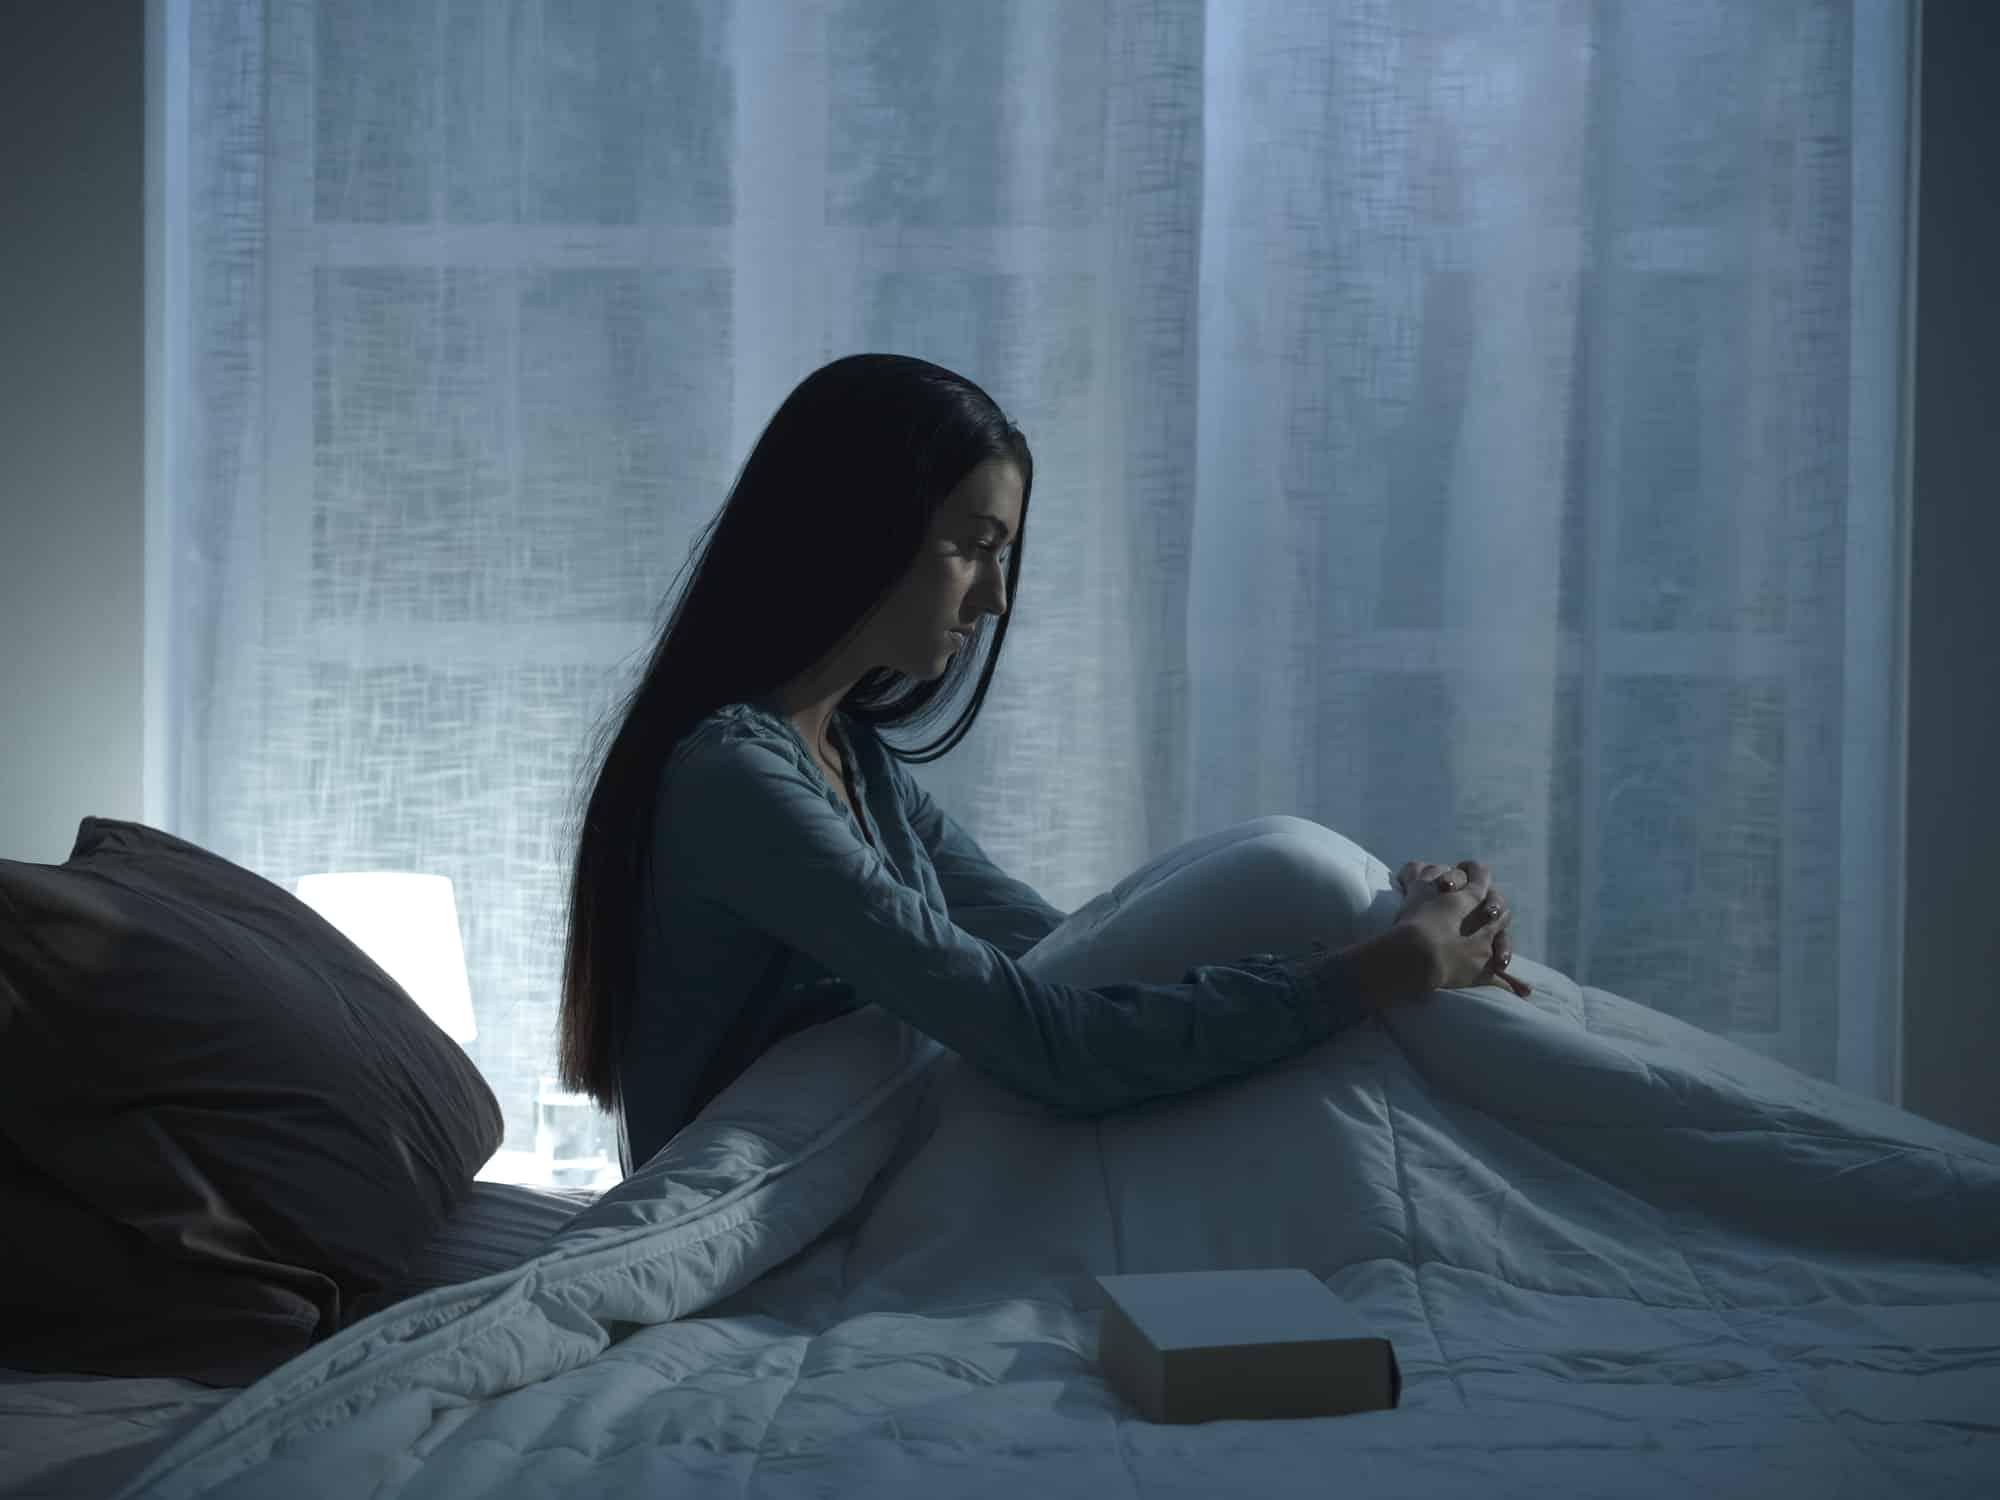 Sleep and mental health issues